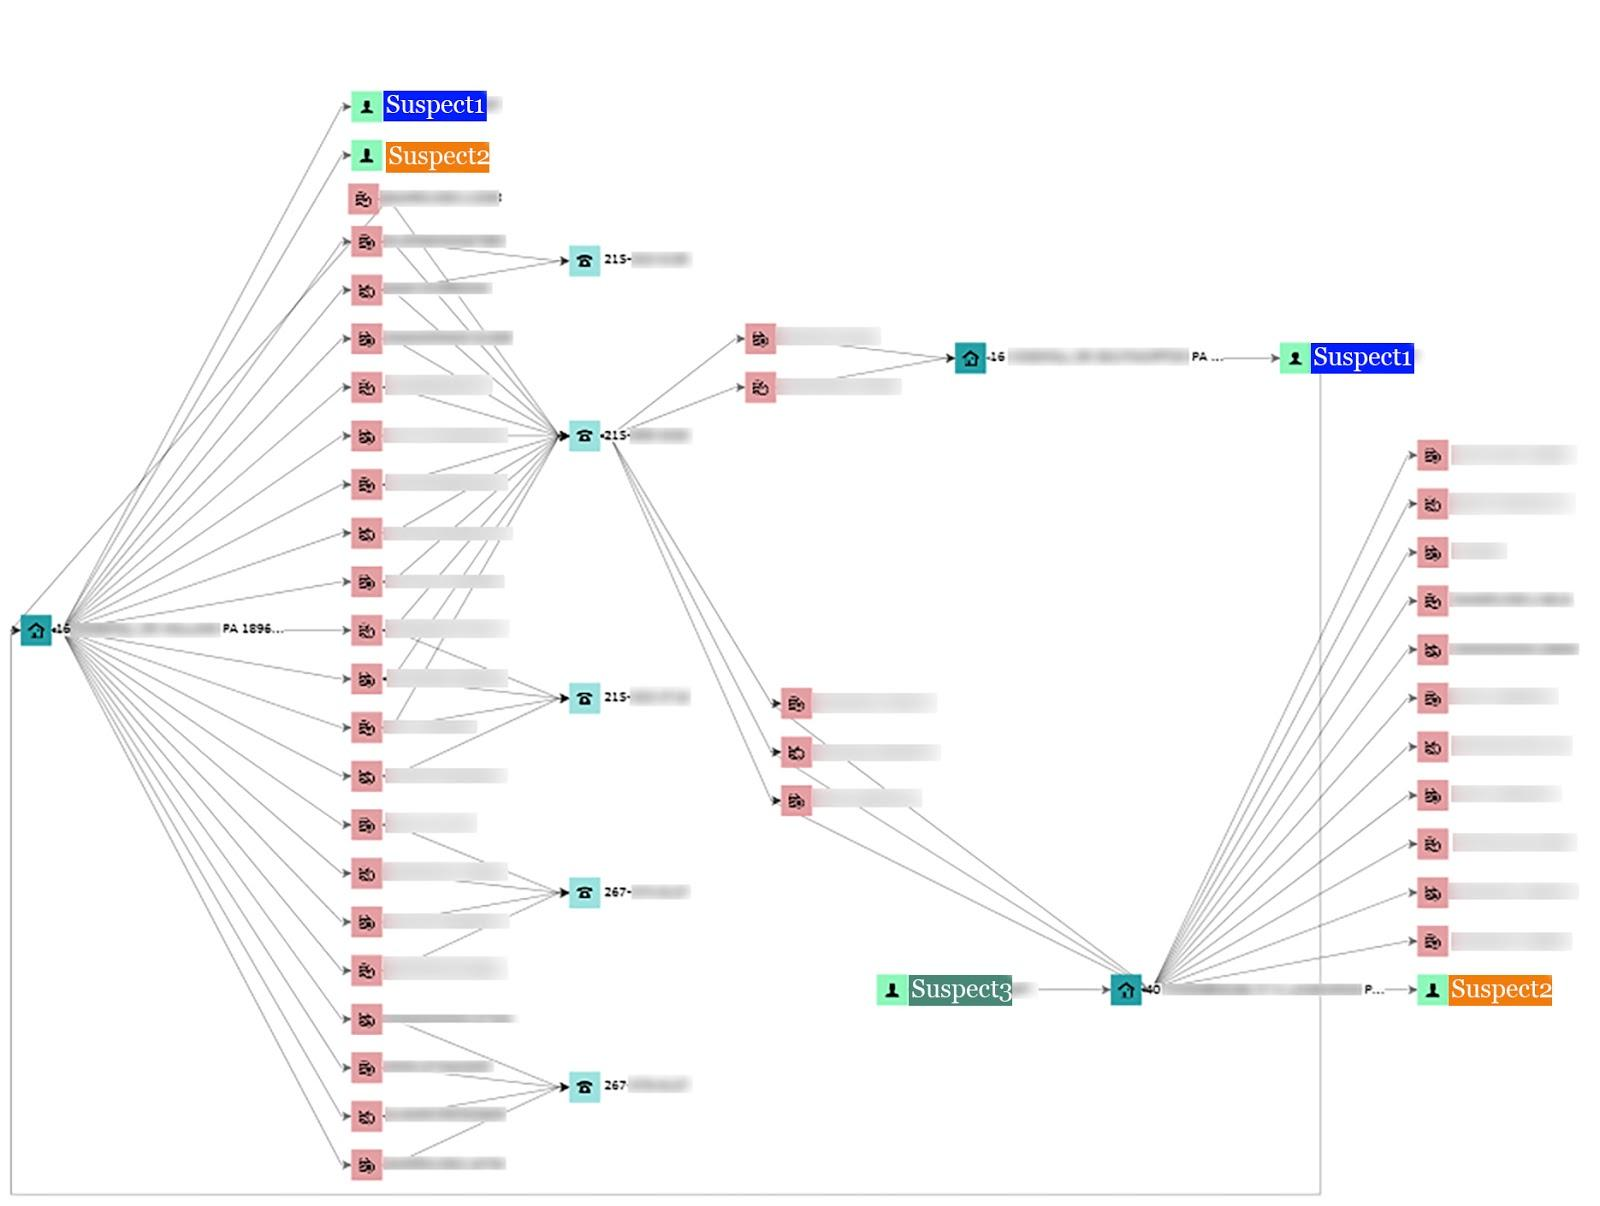 pscu-graph-fraud-intelligence-linked-analysis.jpg